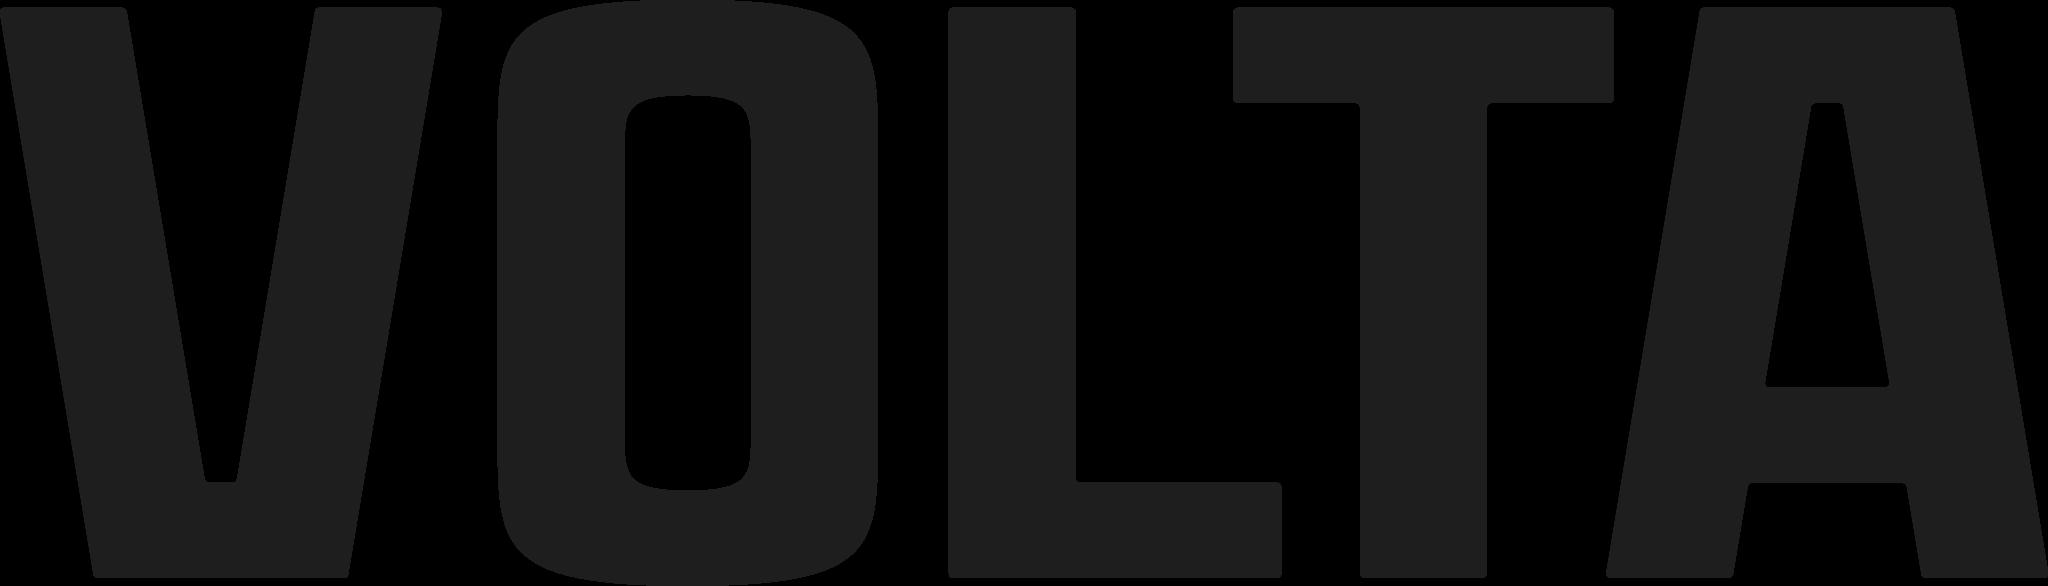 Volta Alternate Logo